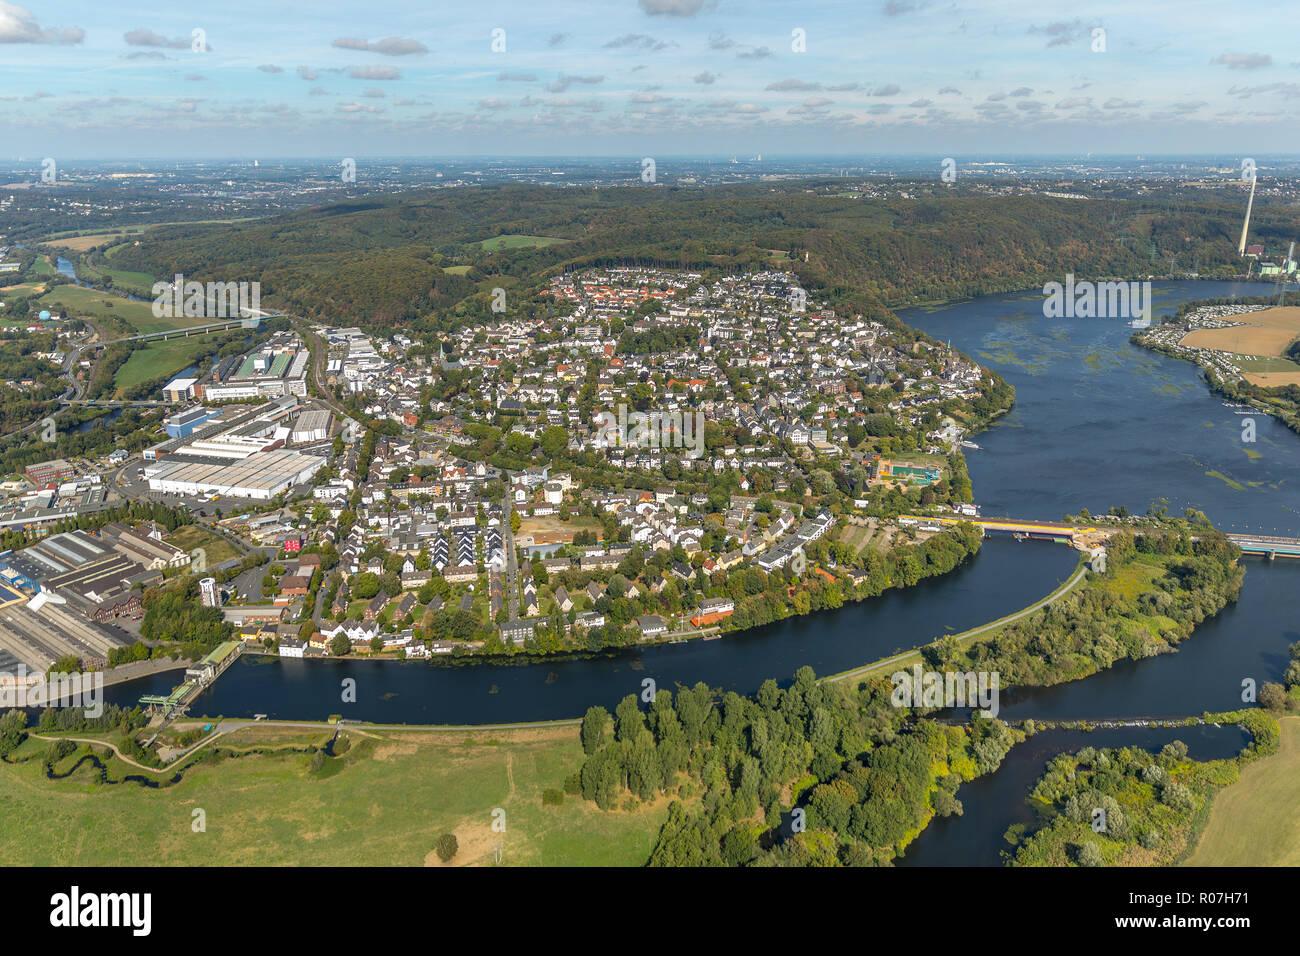 Aerial view, overview weather, Obergraben, Ruhr, Harkortsee, running water power plant, run-of-river power station, dam, bridge, industrial estate, Ru - Stock Image